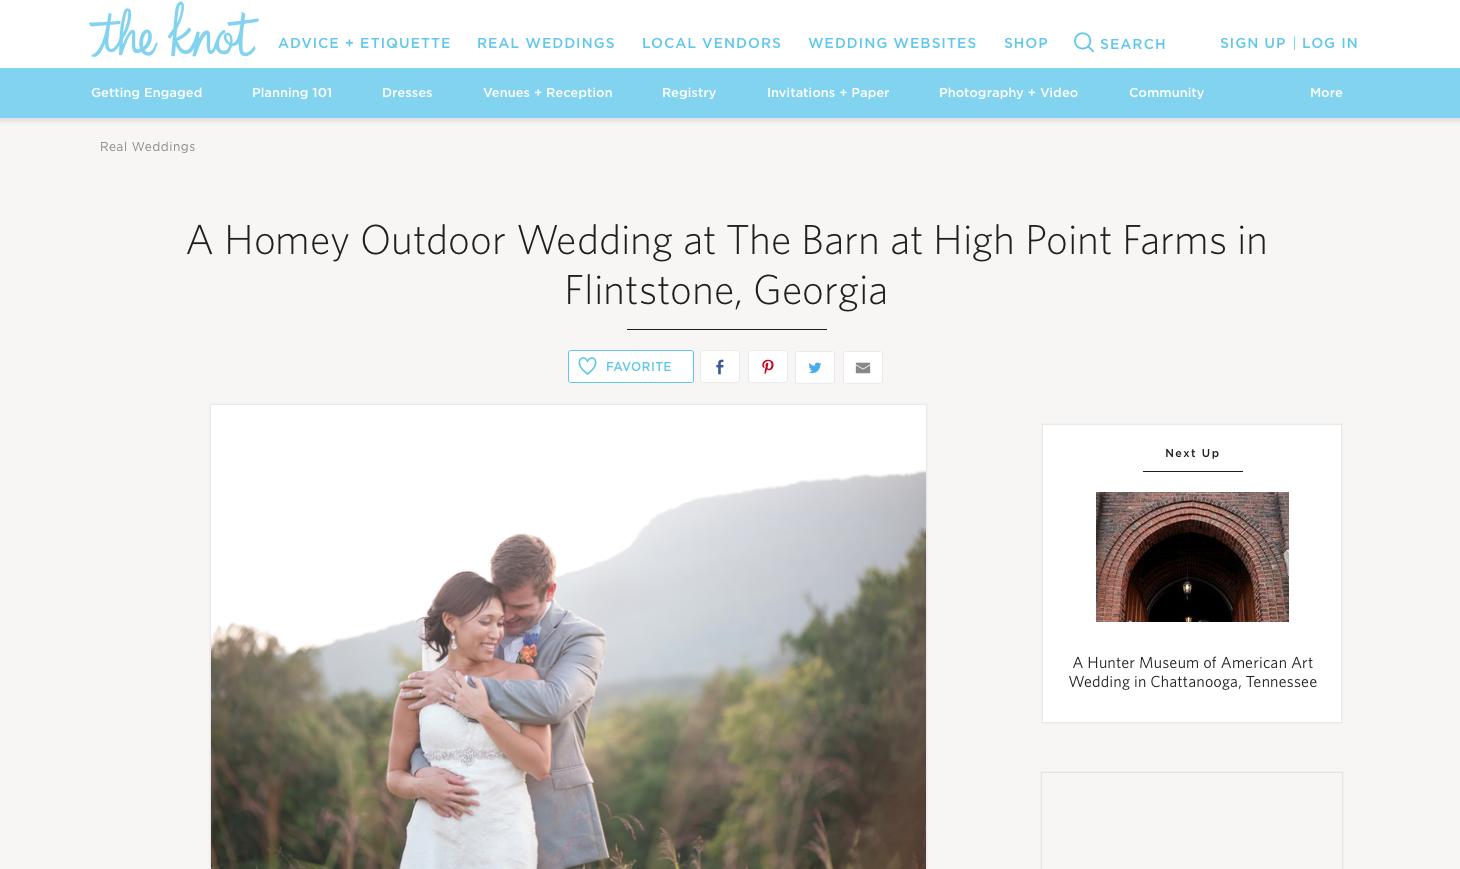 atlanta wedding photographer featured on the knot wedding website best atlanta wedding photographer mountain